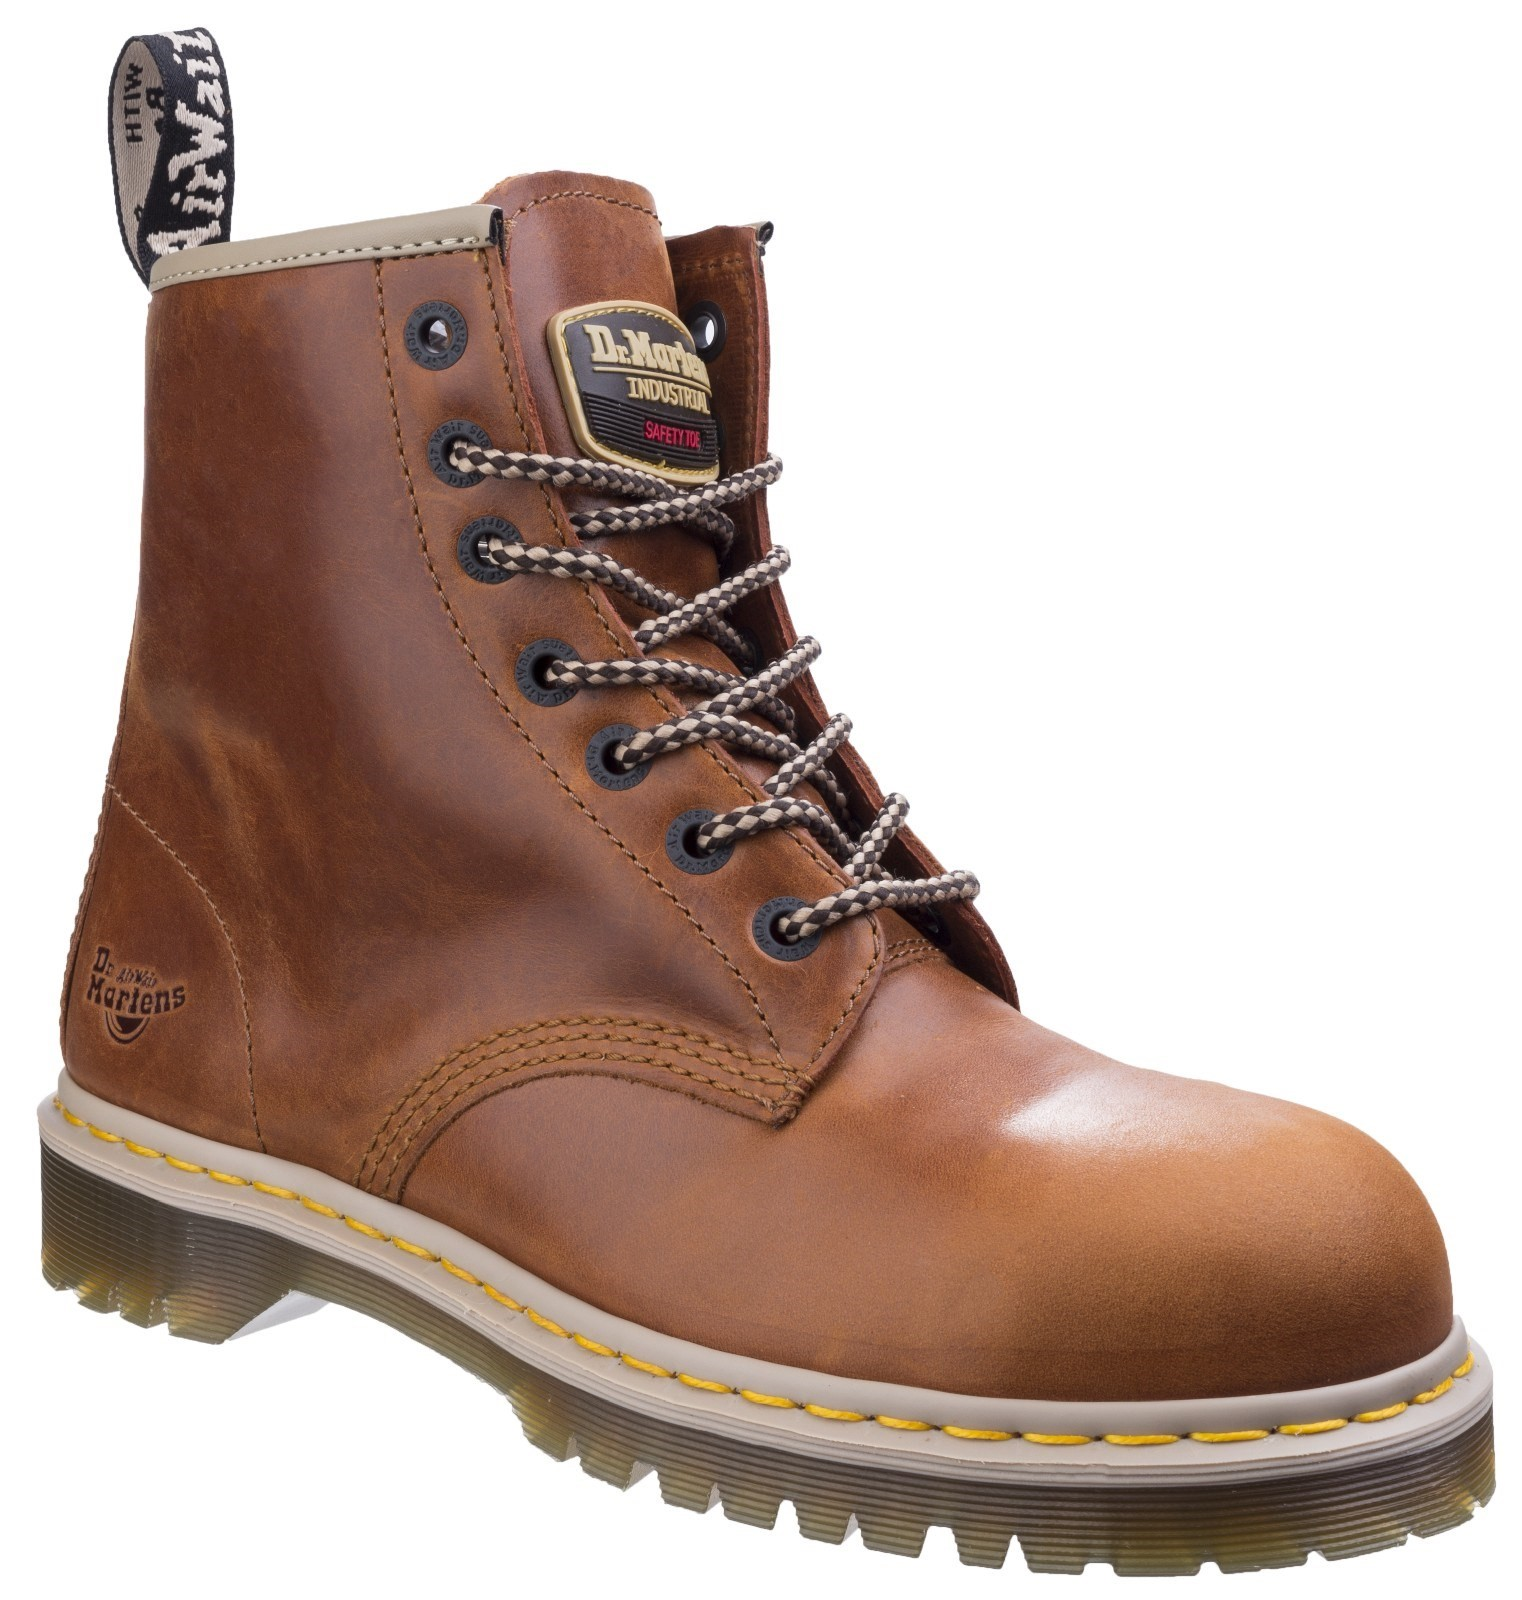 b8de0263388 DR MARTENS 7B10 SB tan 7 eyelet Airwair DM steel toe safety boot size 3 UK